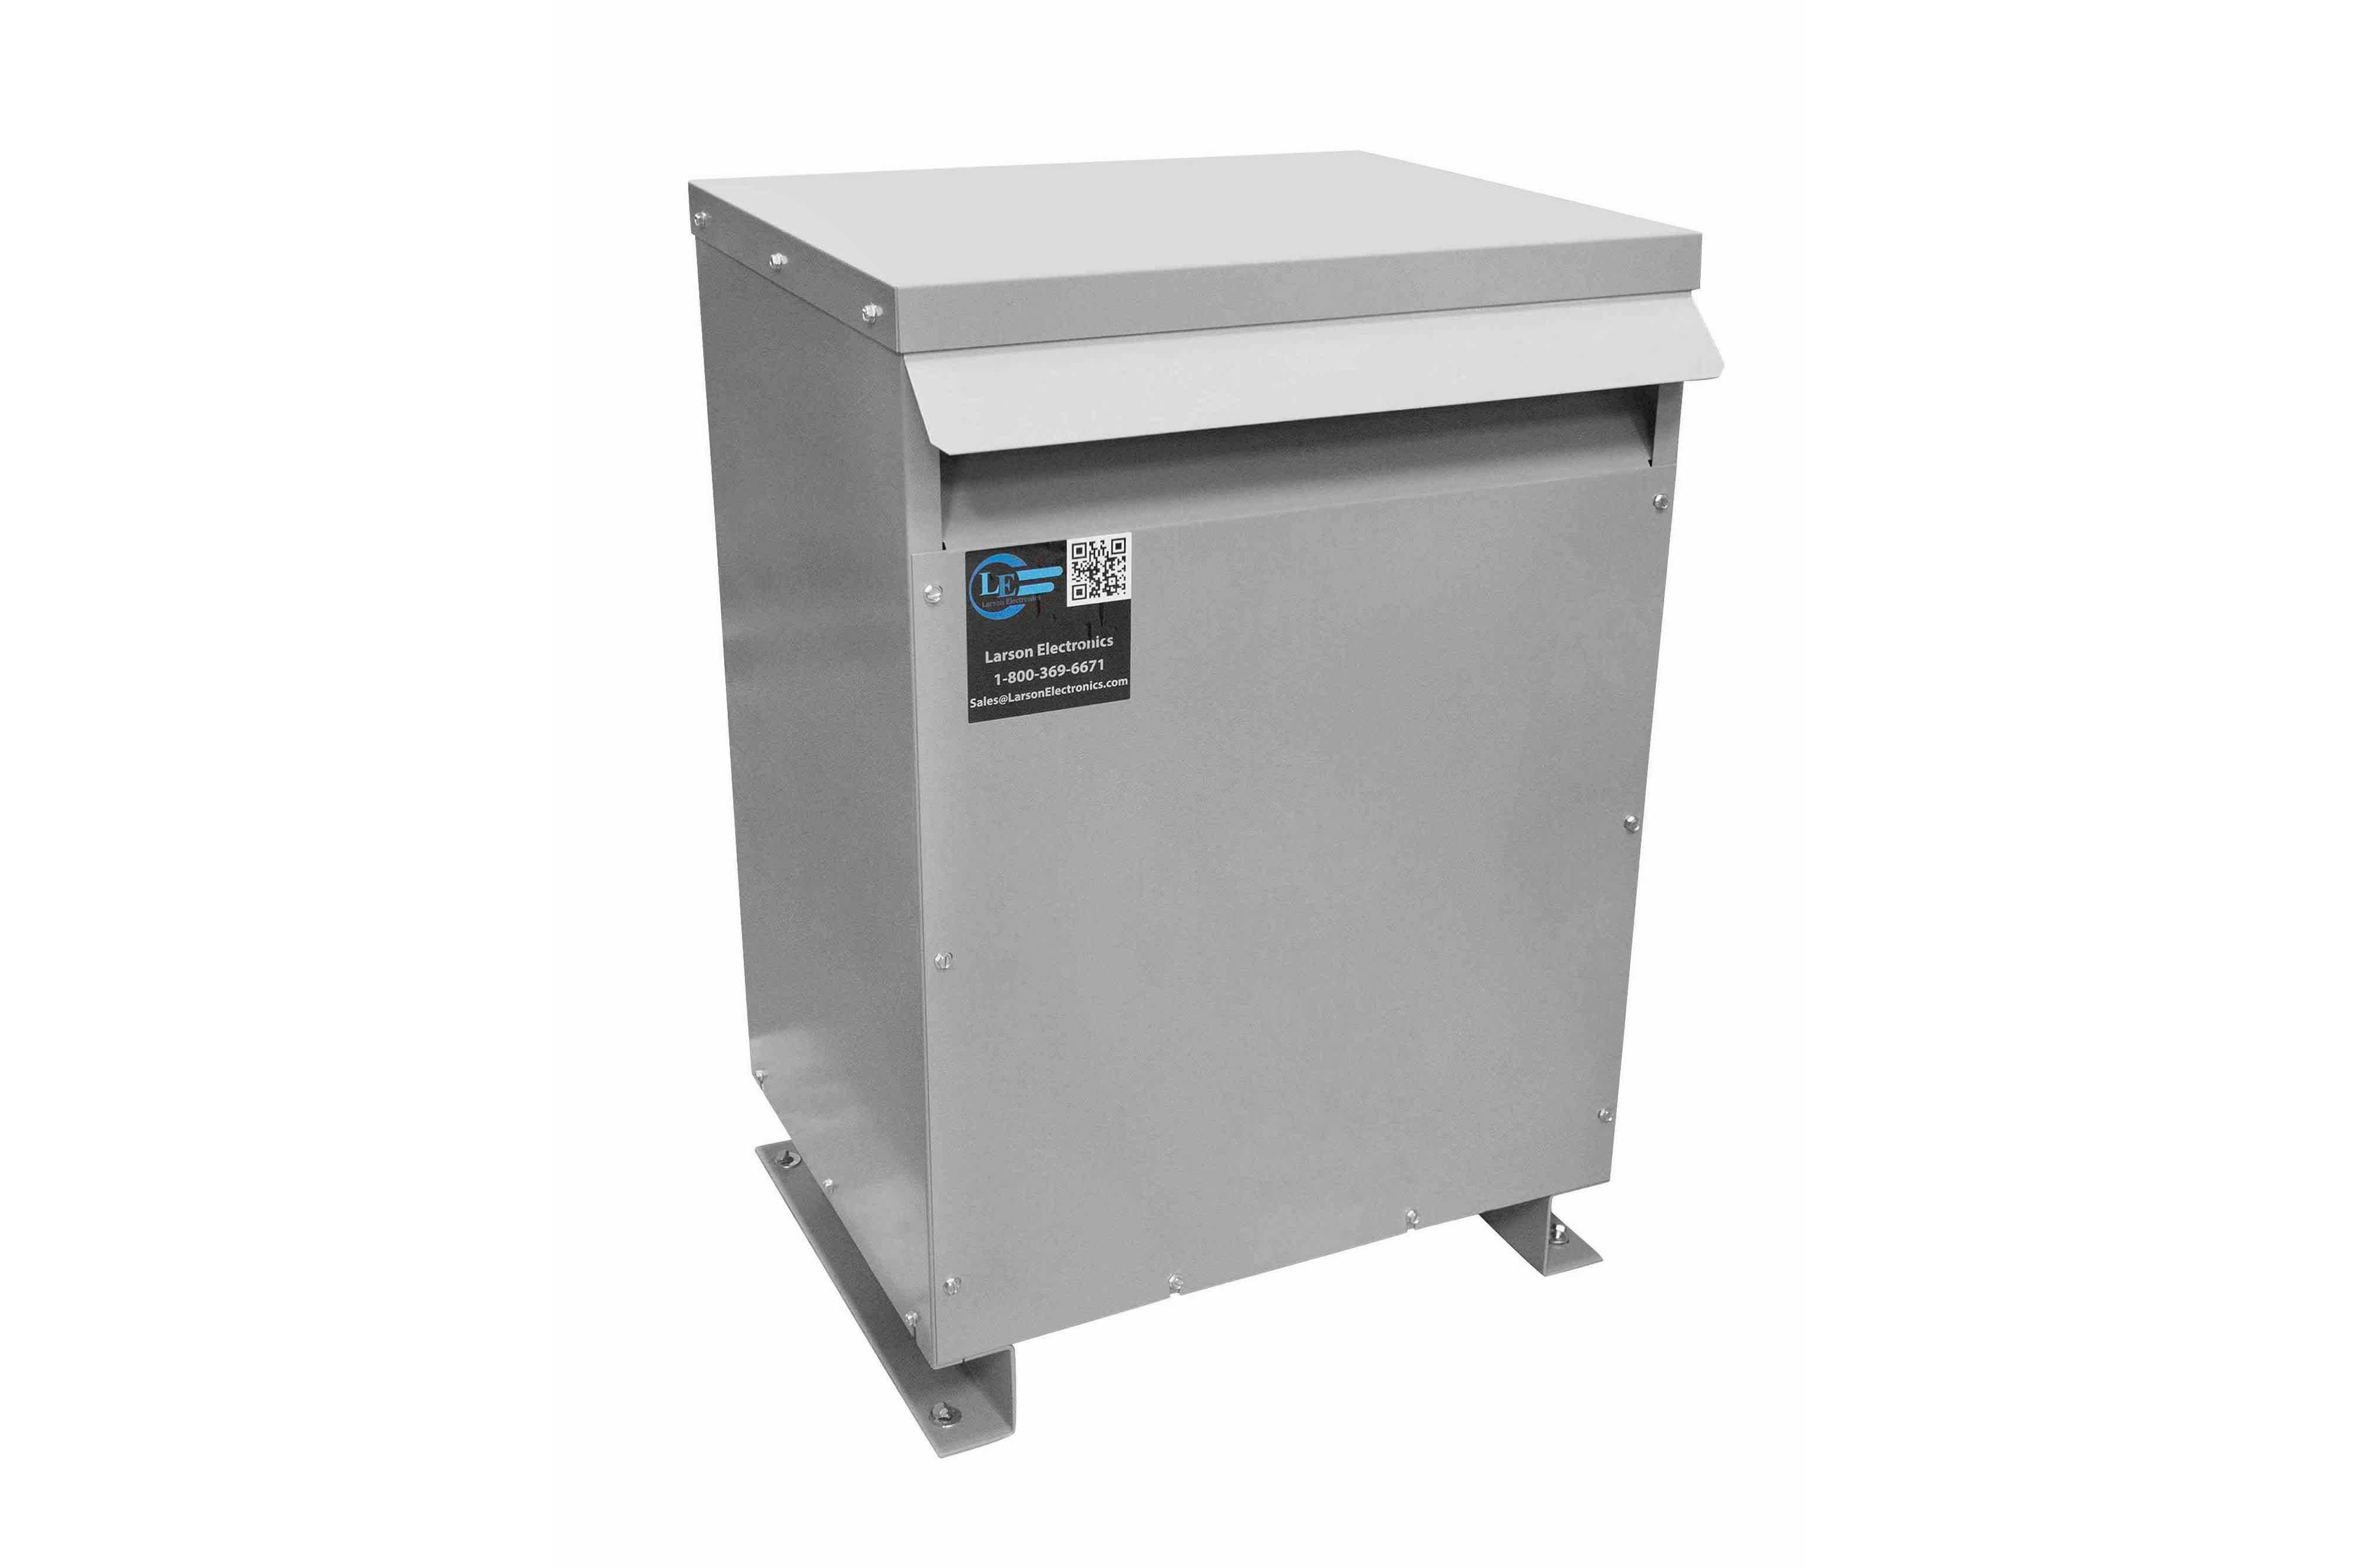 1000 kVA 3PH Isolation Transformer, 208V Wye Primary, 600Y/347 Wye-N Secondary, N3R, Ventilated, 60 Hz